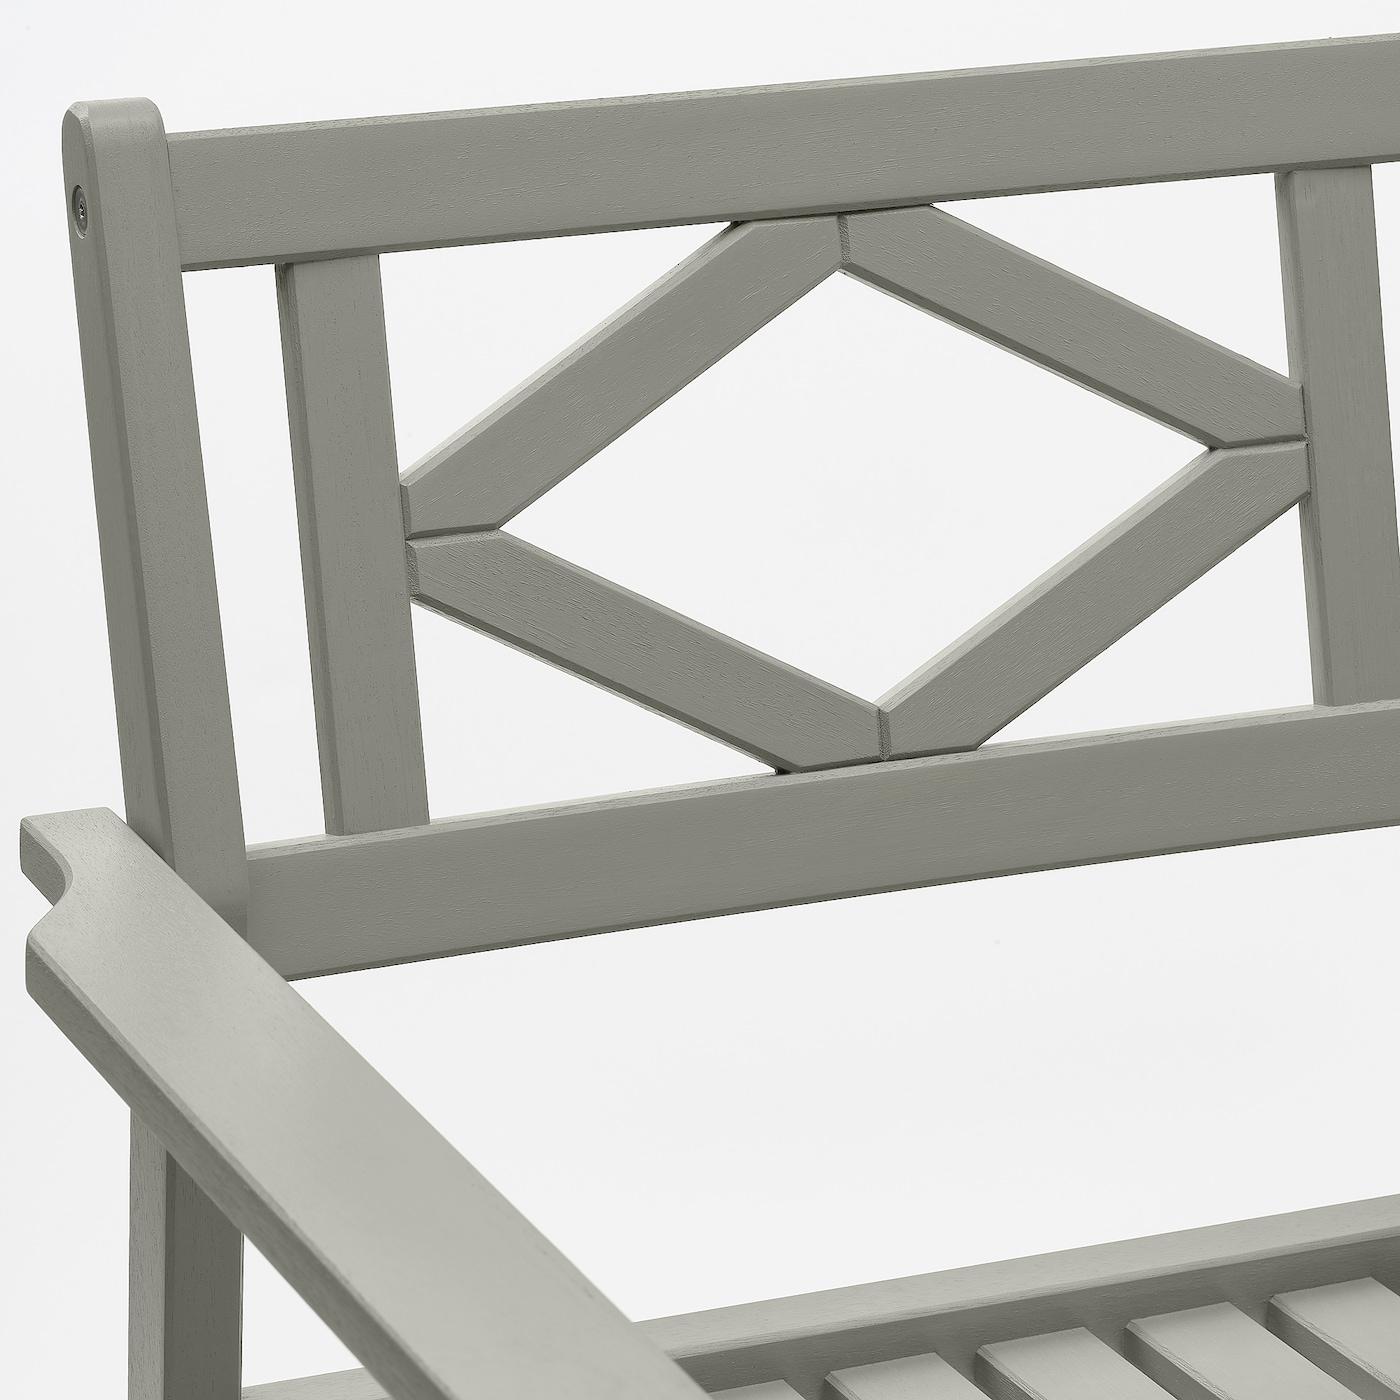 BONDHOLMEN Table+2 chairs w armrests, outdoor, grey stained/Järpön/Duvholmen anthracite